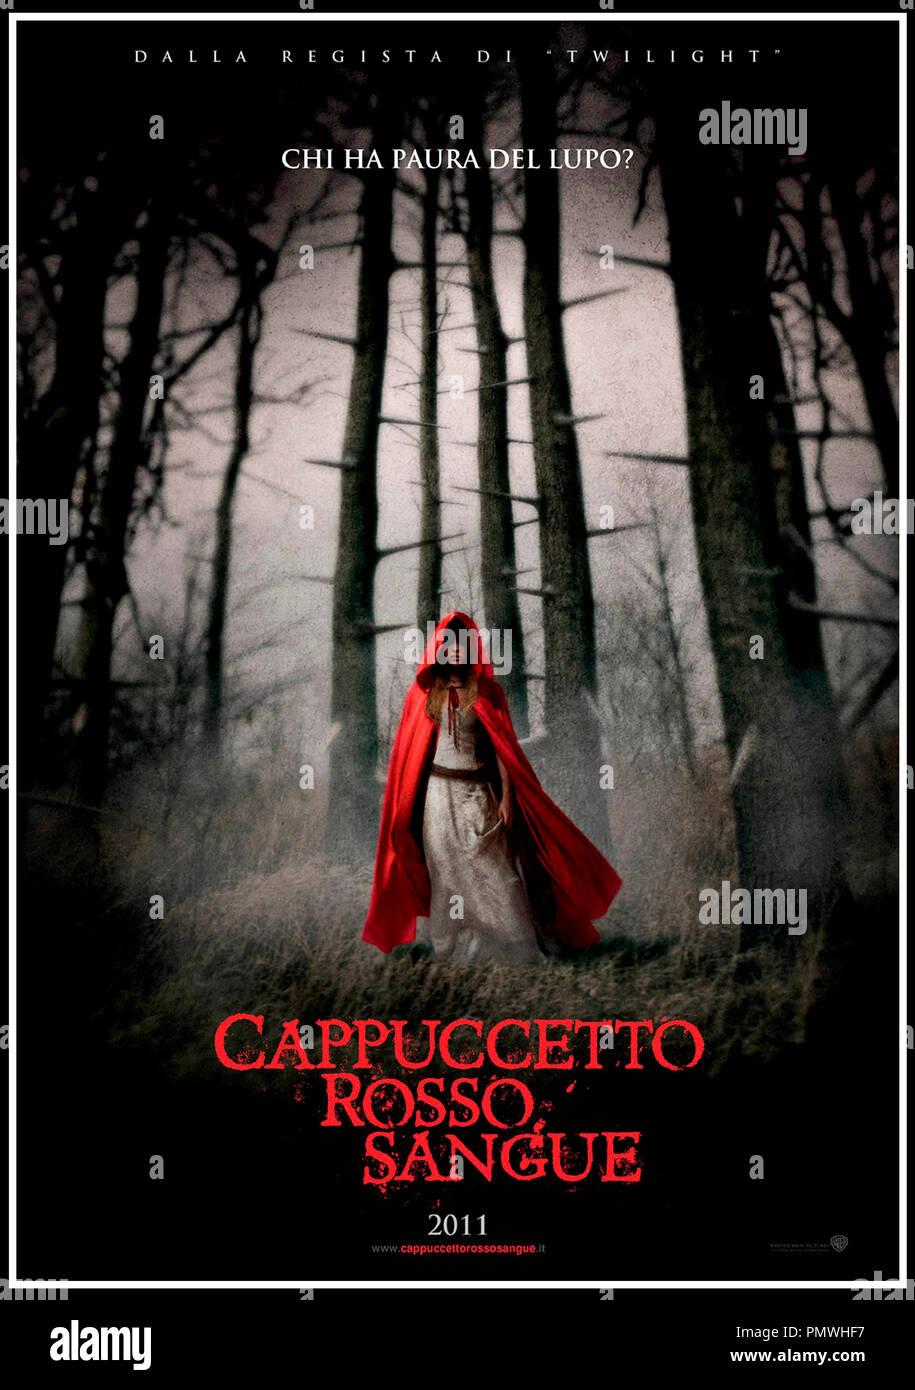 Prod DB © Warner Bros  Pictures - Appian Way - Random Films